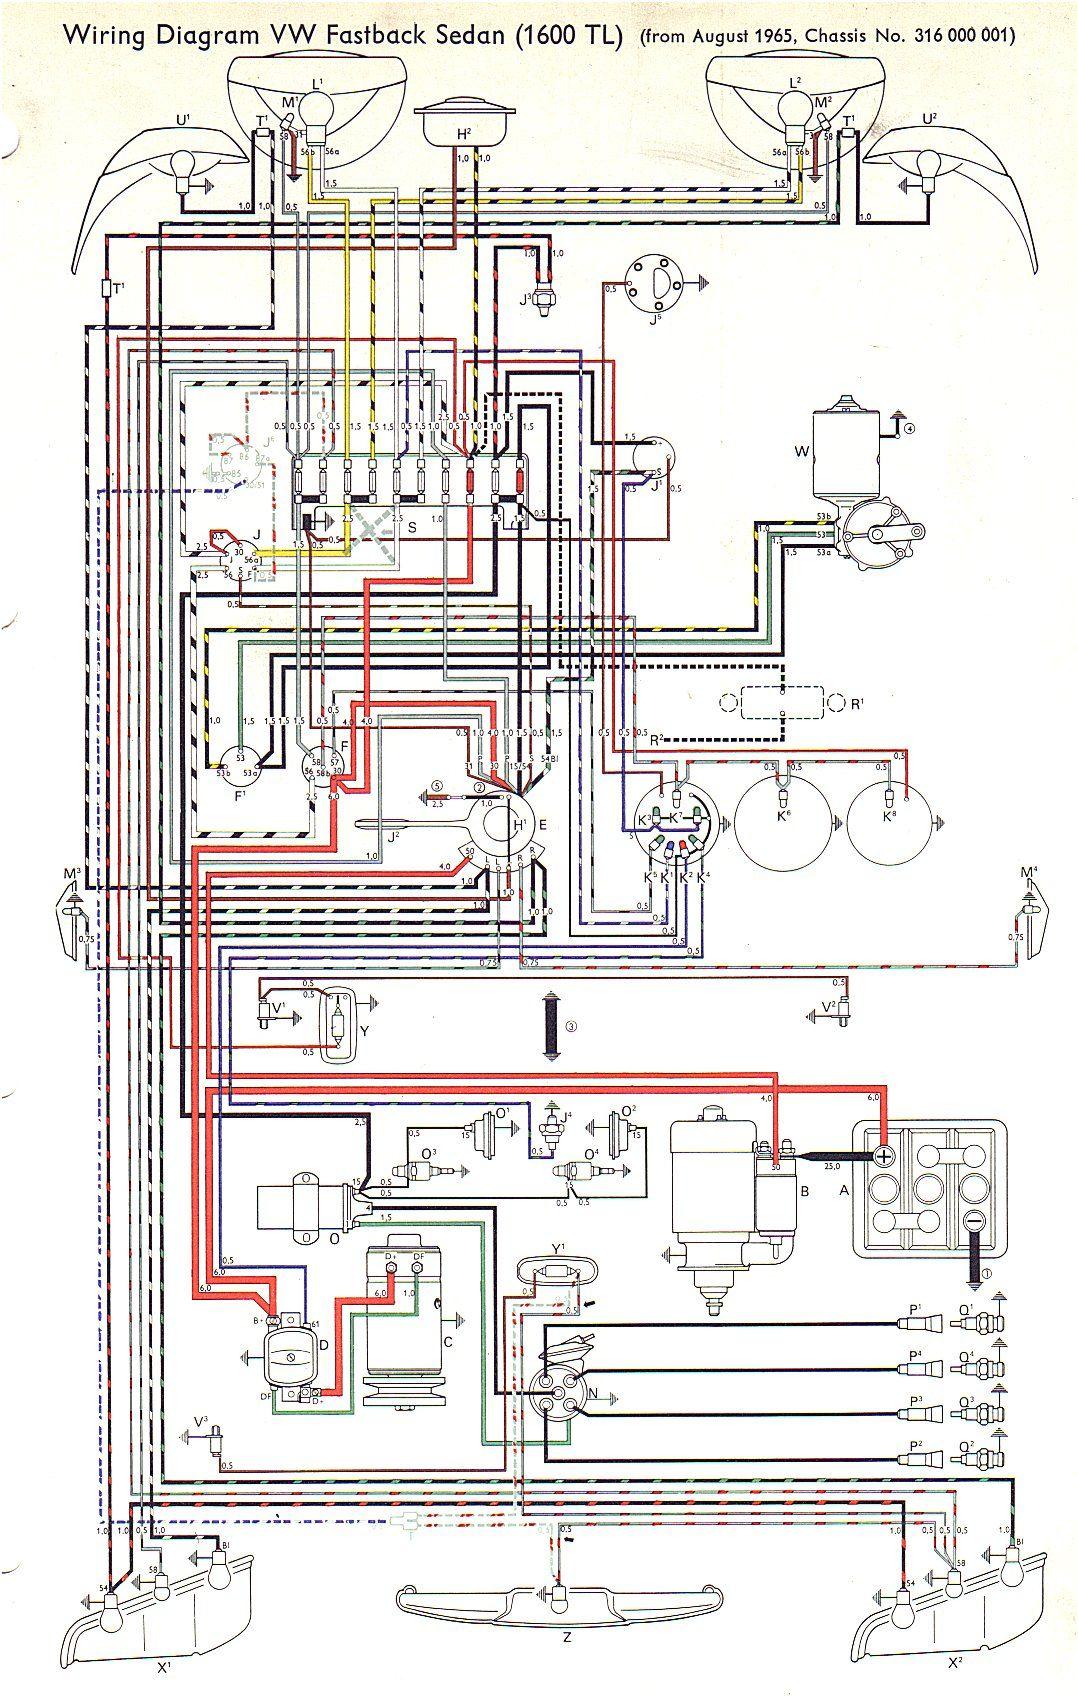 vw type 3 wiring diagrams in vw diagram in 2003 vw passat wiring diagram [ 1078 x 1696 Pixel ]